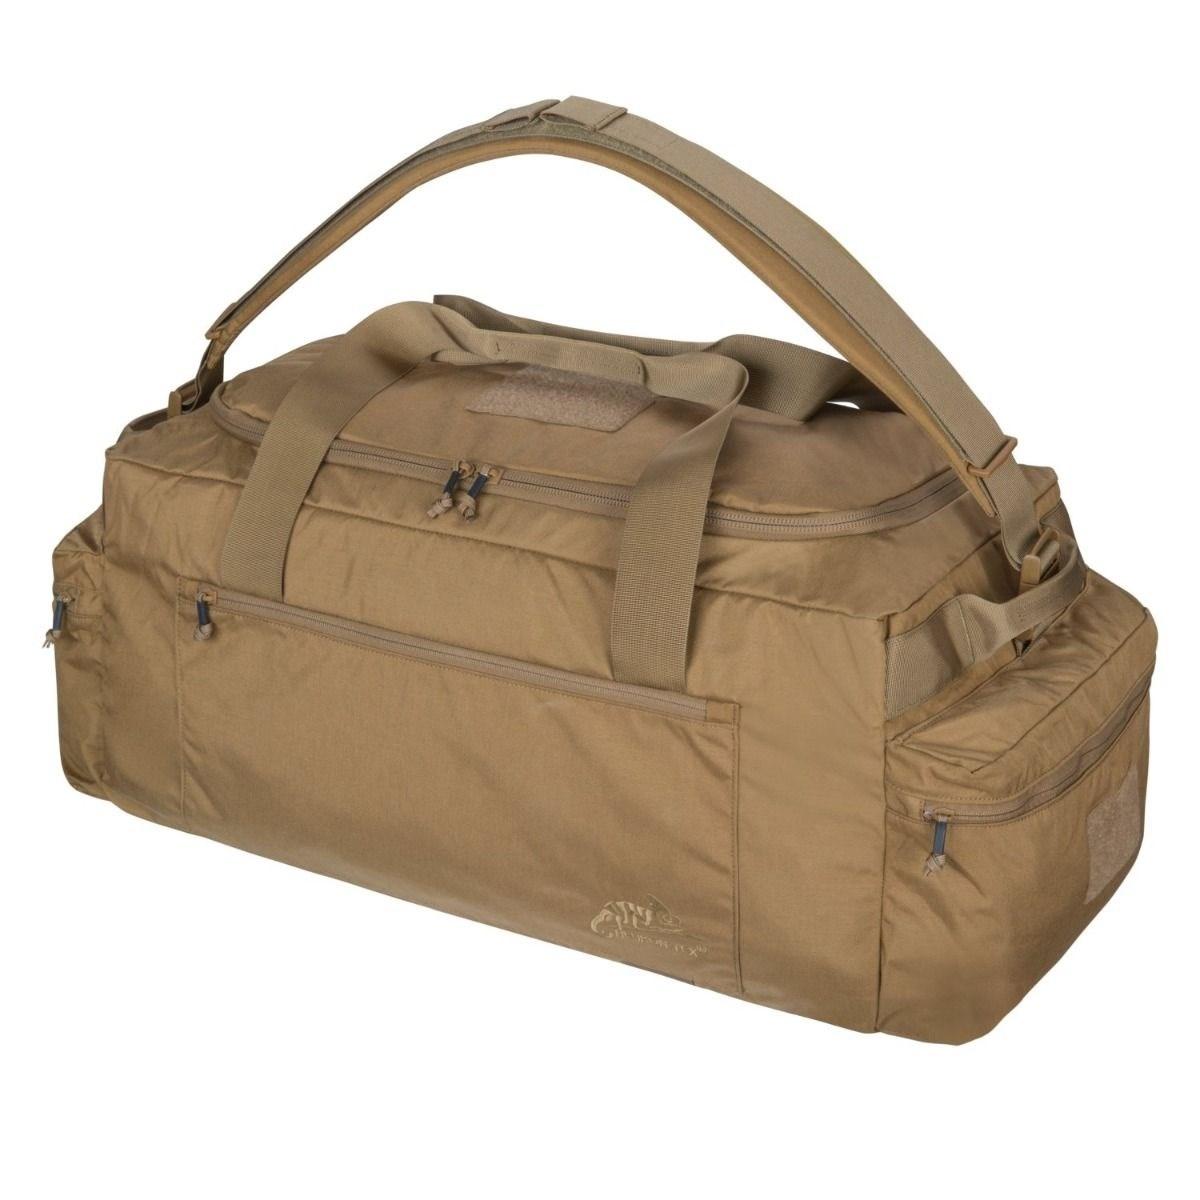 Taška URBAN TRAINING BAG® velká COYOTE - zvìtšit obrázek